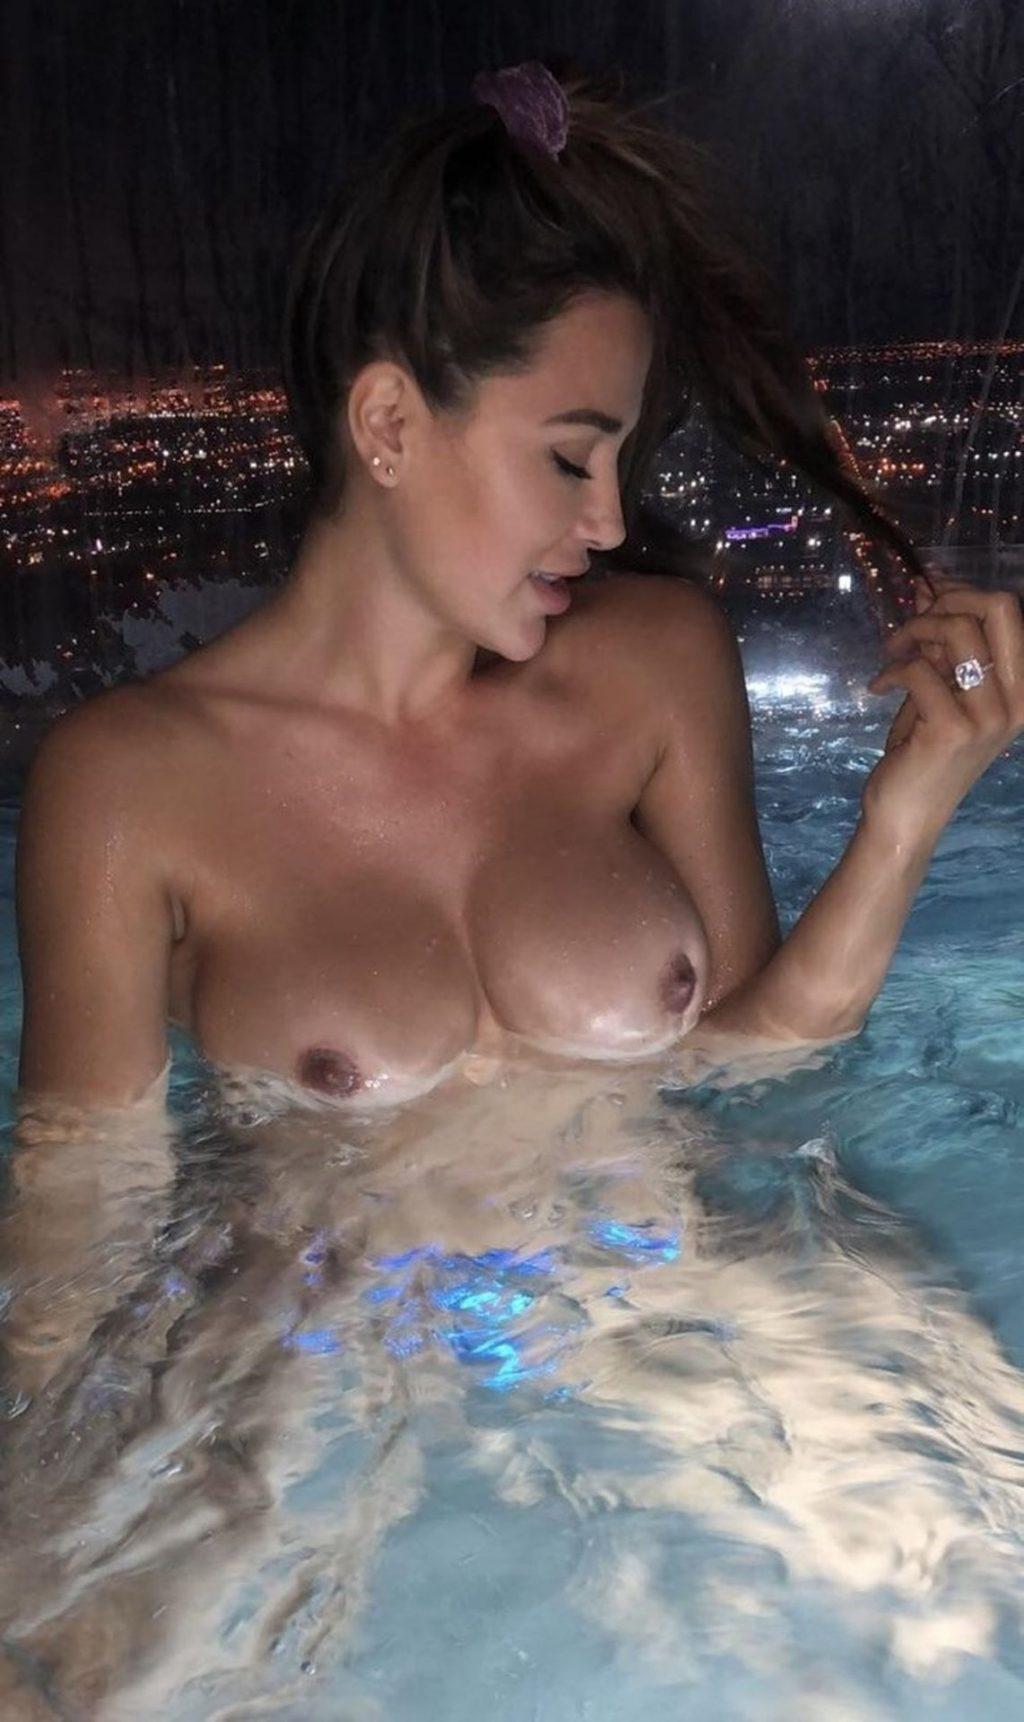 Ana Cheri Nude Thefappeningblog Com 2 1 1024x1722